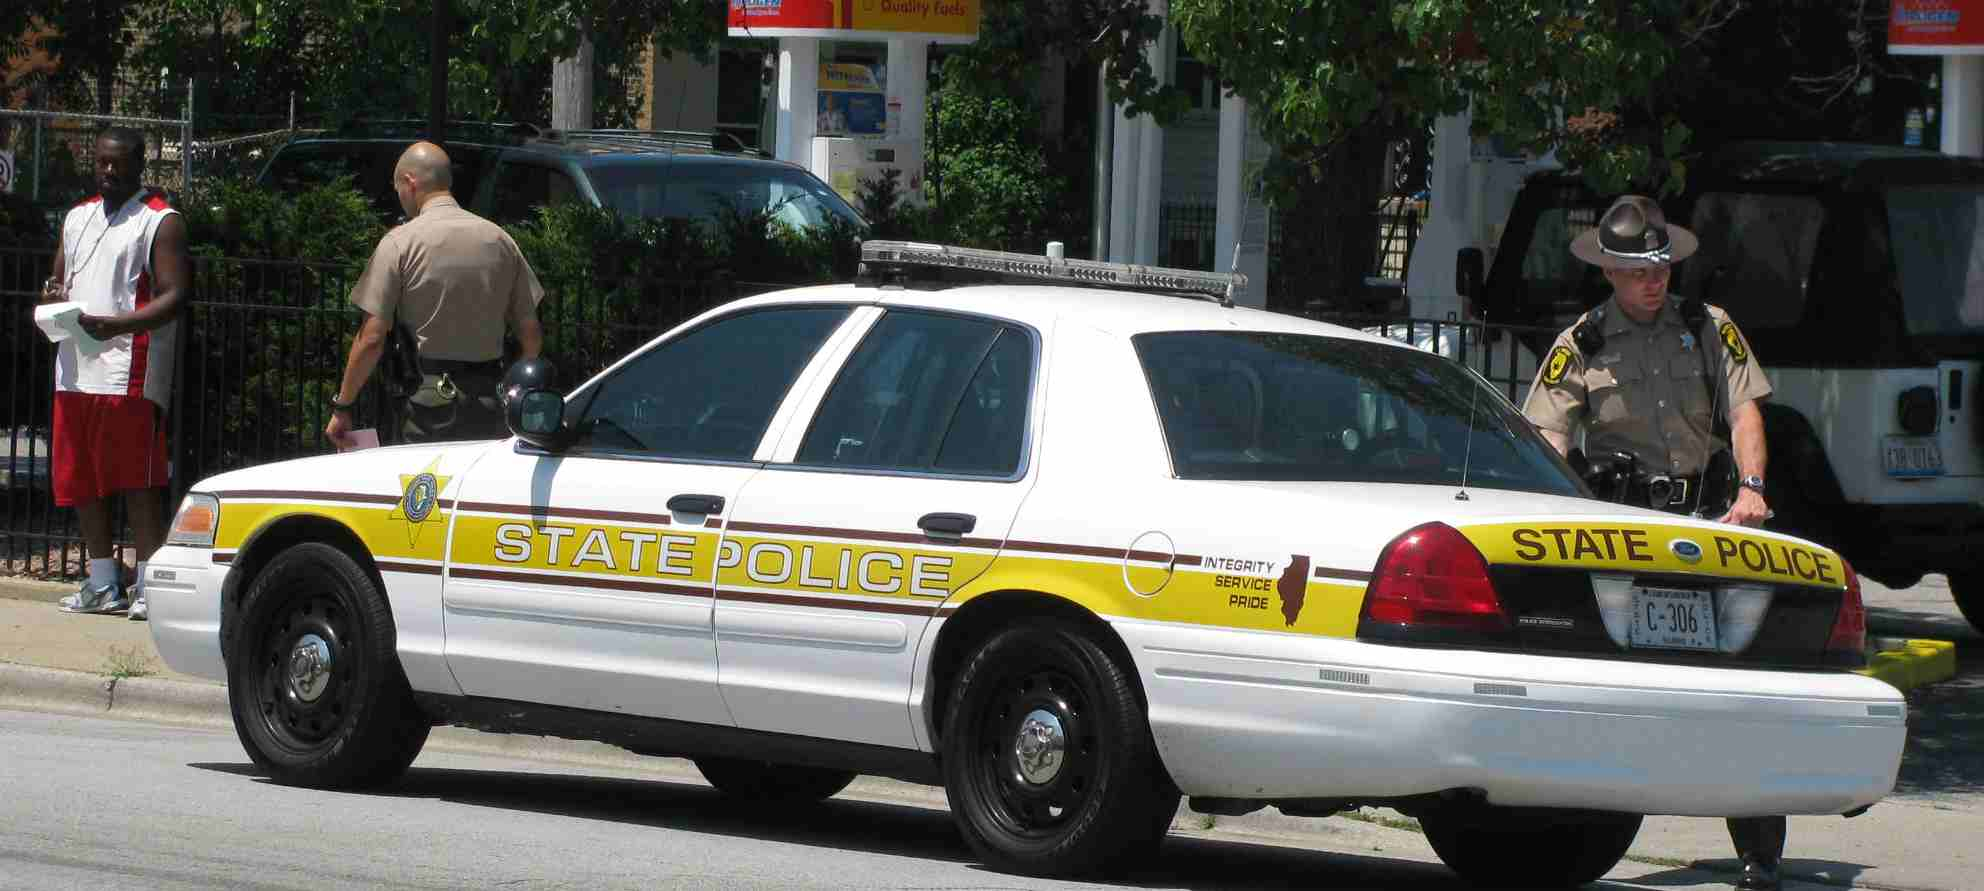 Illinois-State-Police.jpg